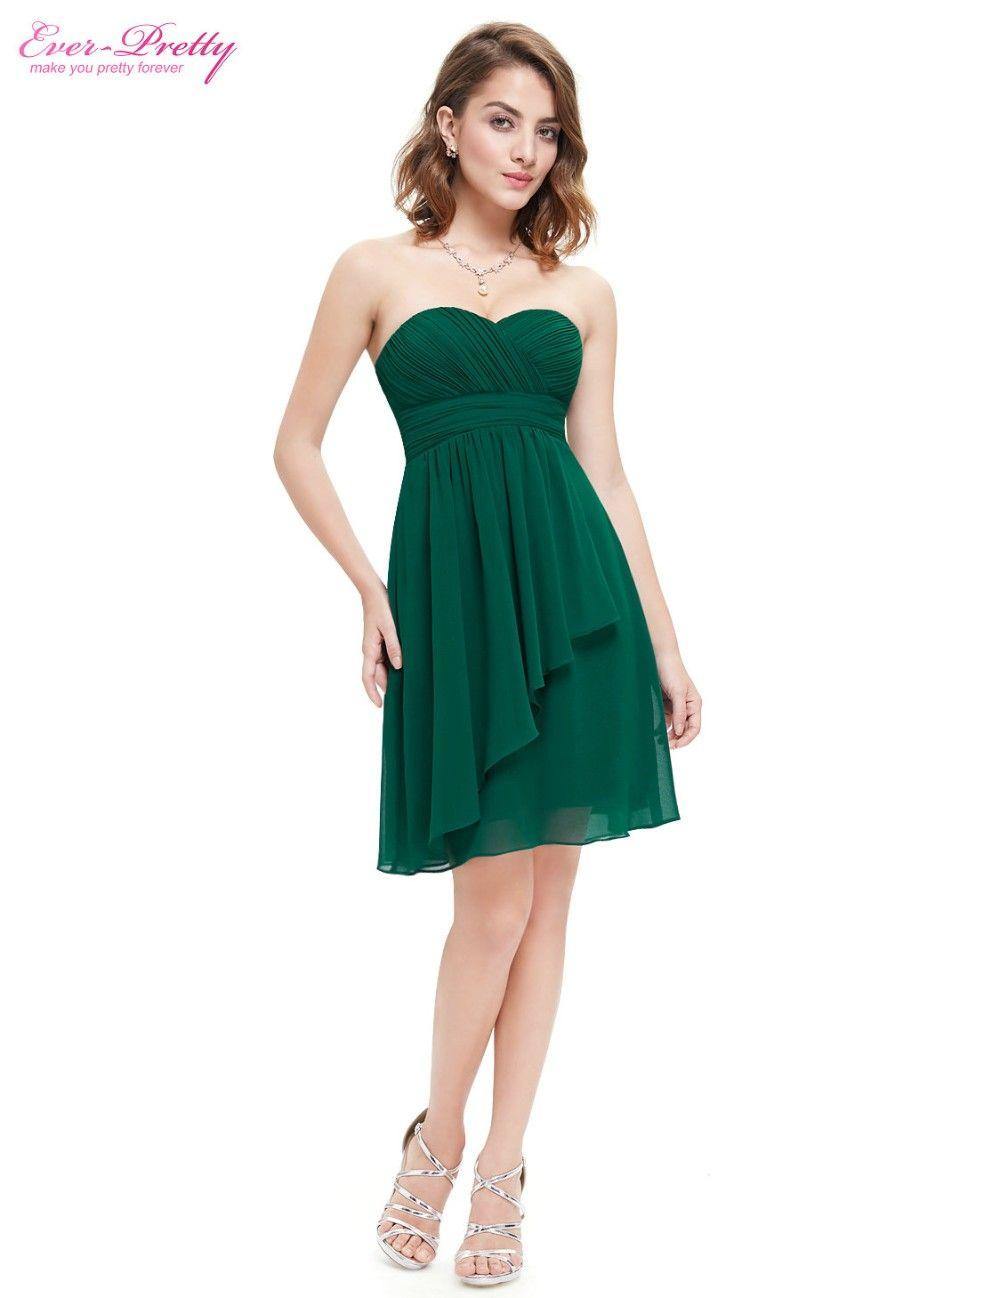 Clearance sale bridesmaid dress a line ever pretty blue coral short